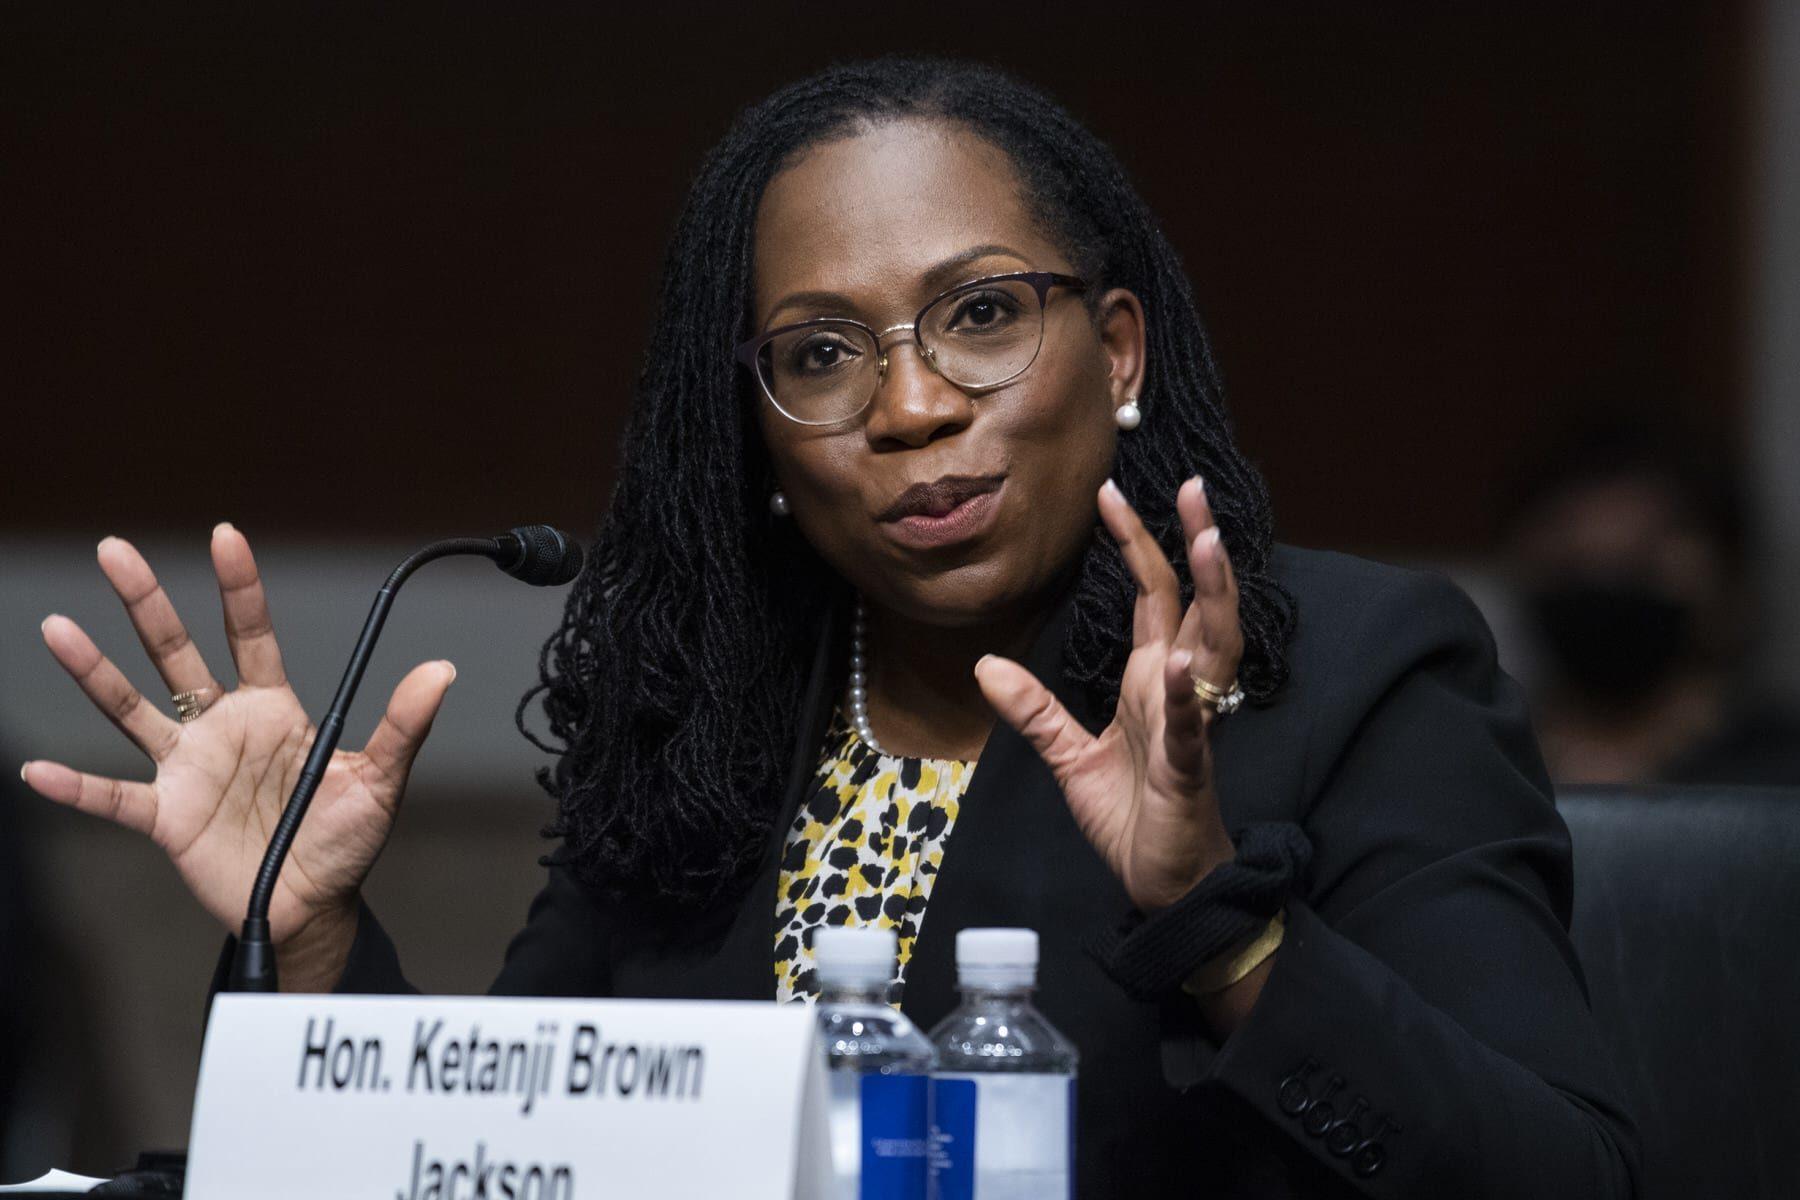 Judge Ketanji Brown Jackson testifying on Capitol Hill